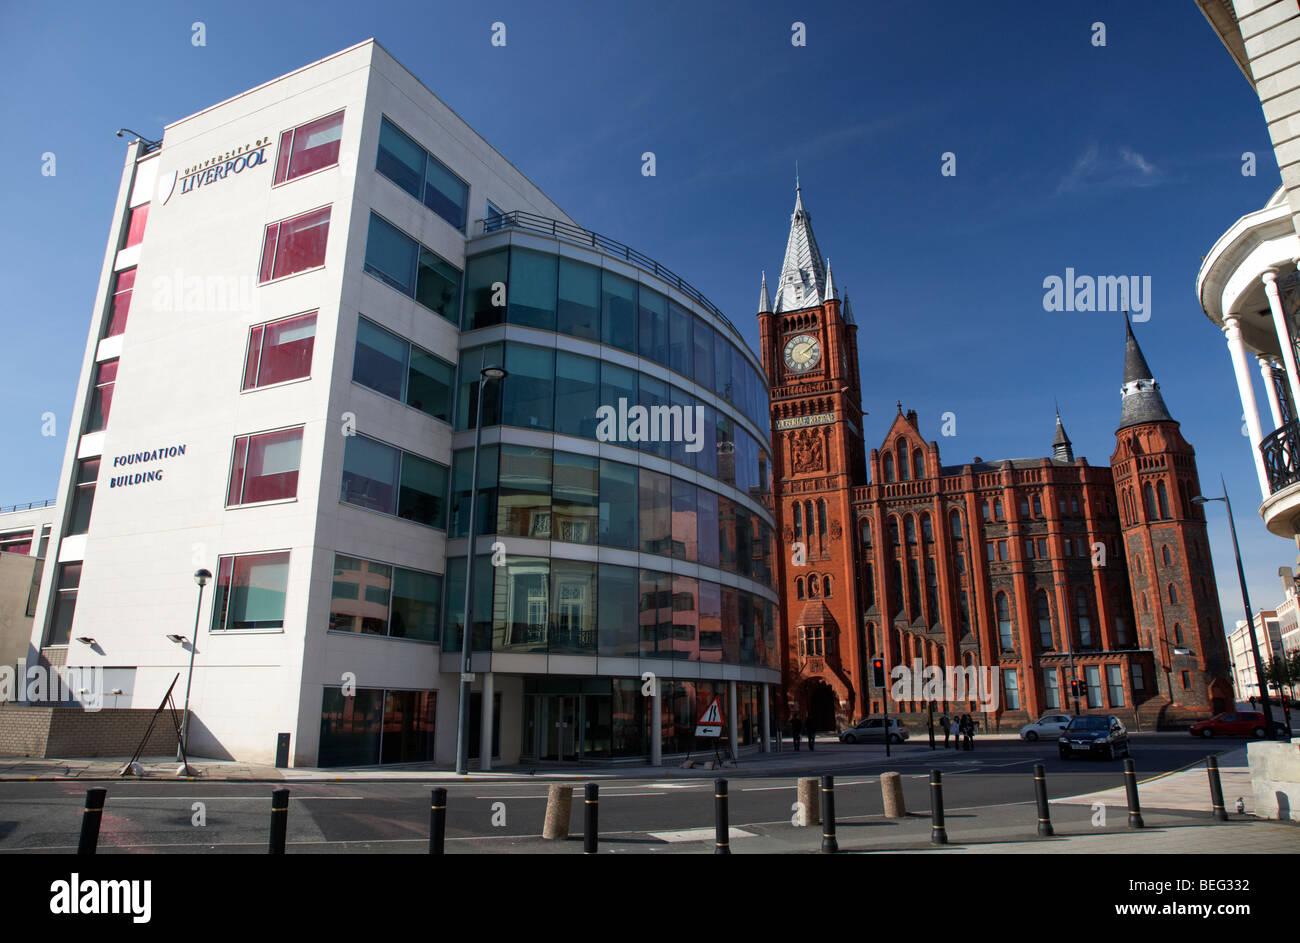 university of liverpool foundation building and old redbrick victoria building liverpool merseyside england uk - Stock Image